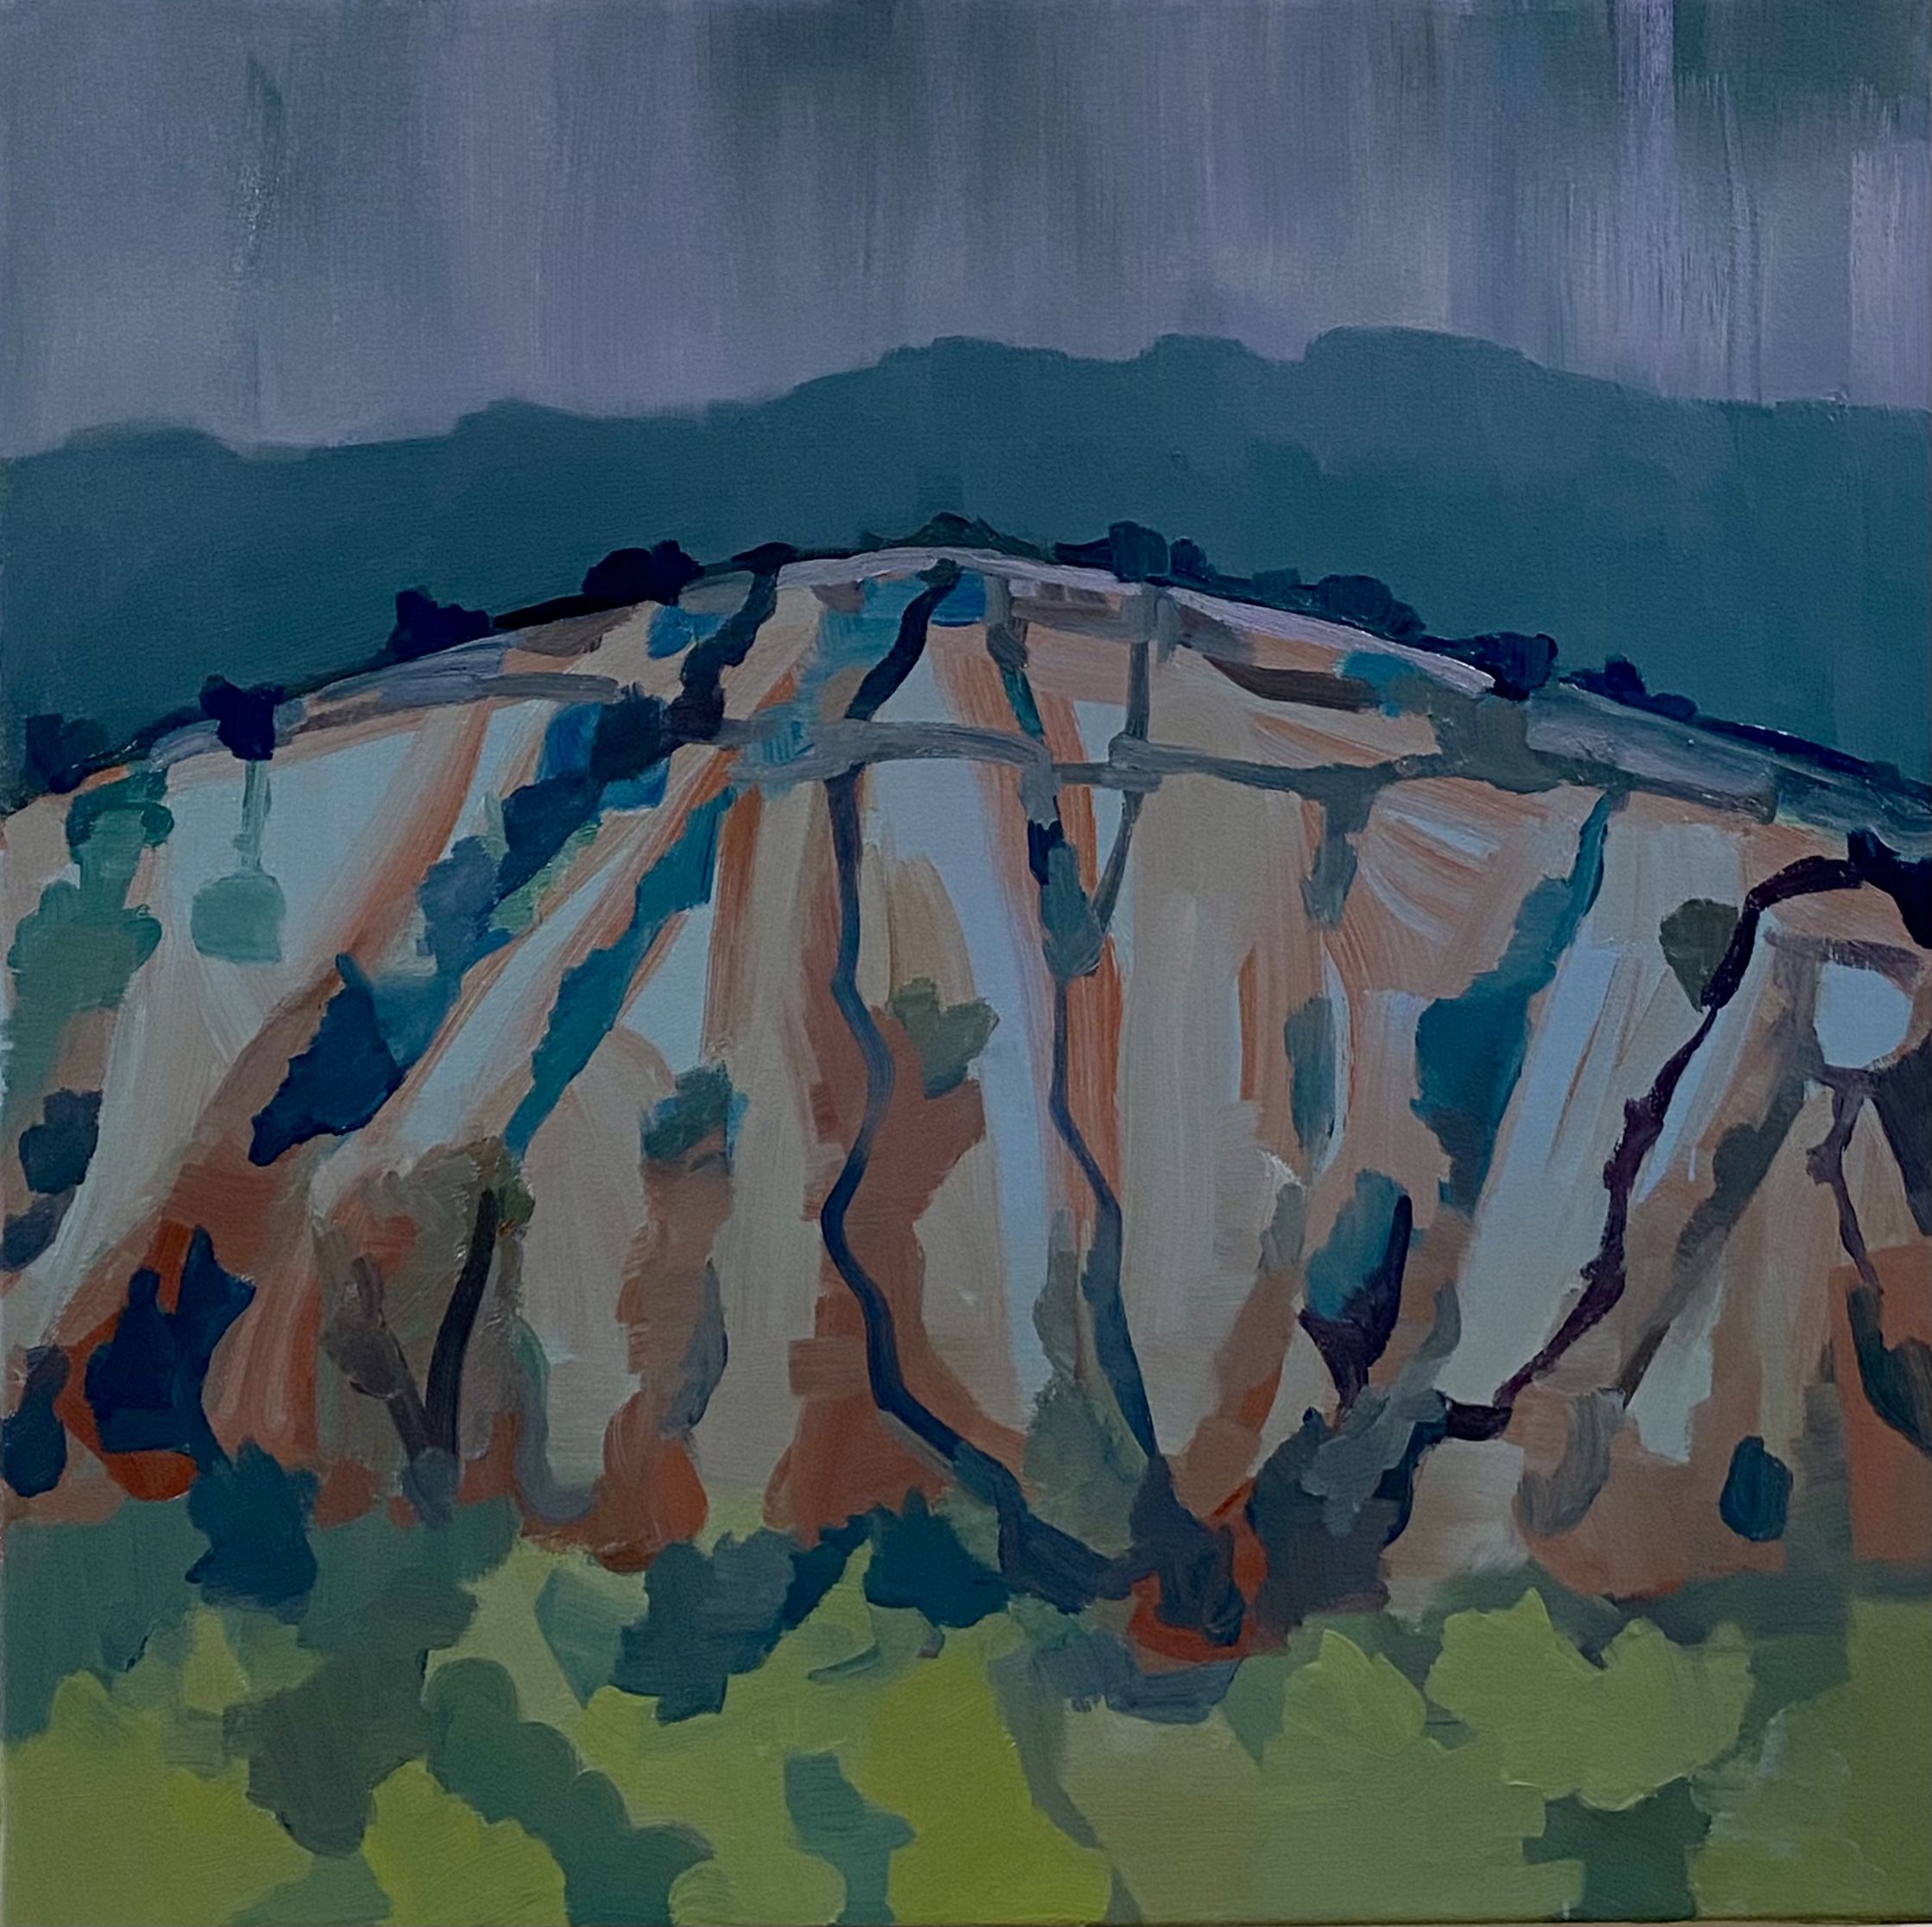 Rain curtain over mountains